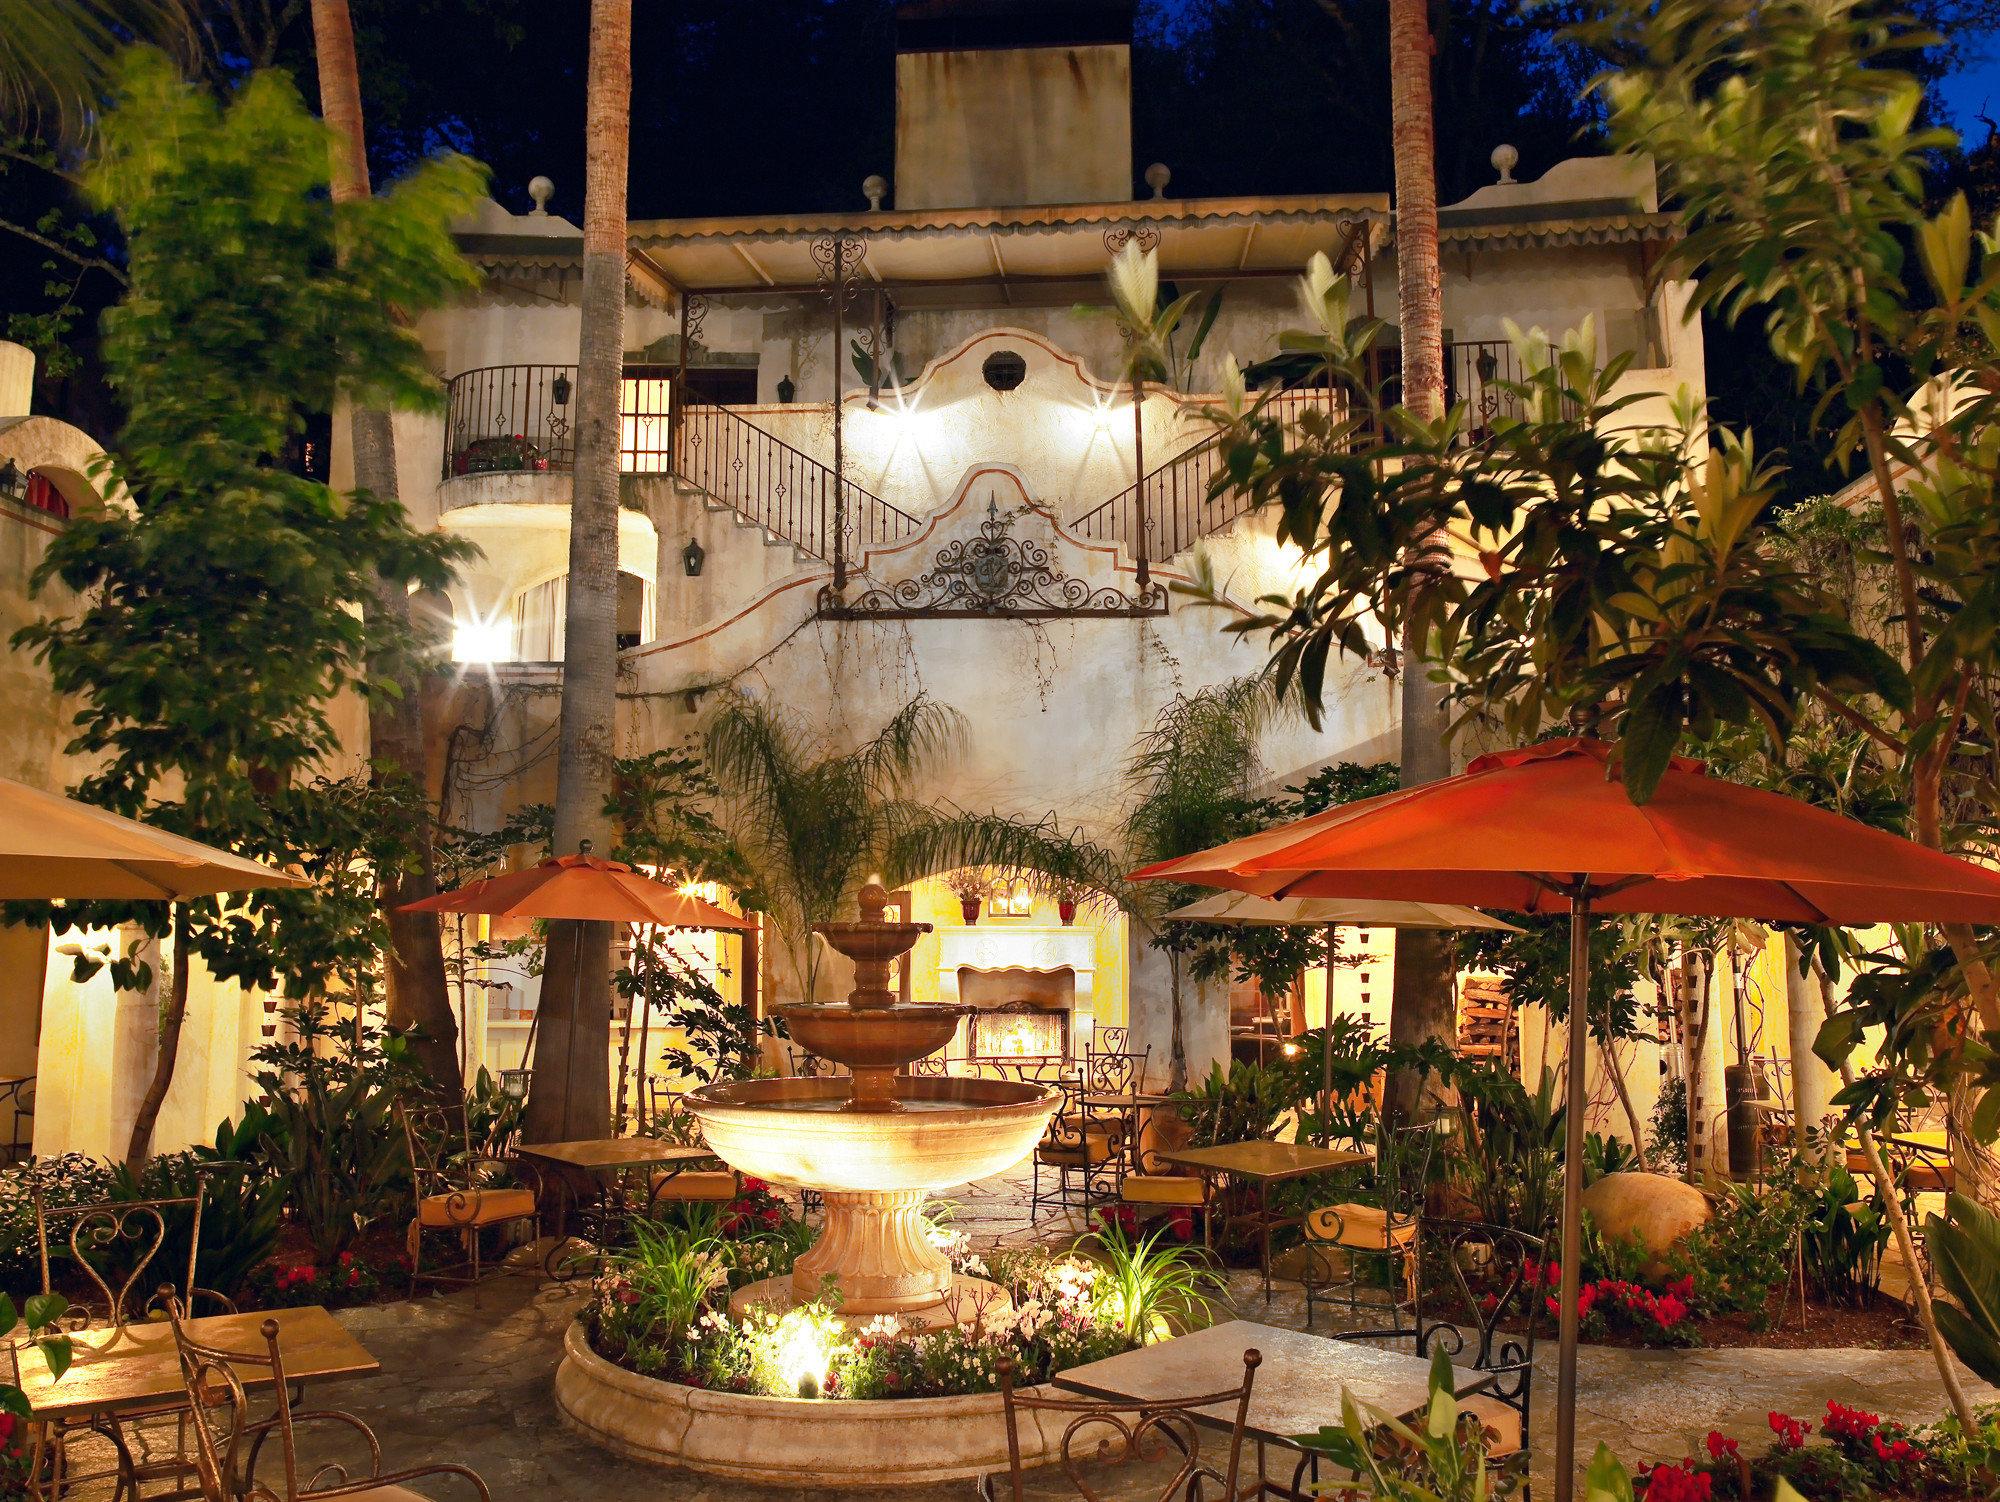 Cultural Exterior Grounds Patio tree building Resort restaurant lighting plant Garden